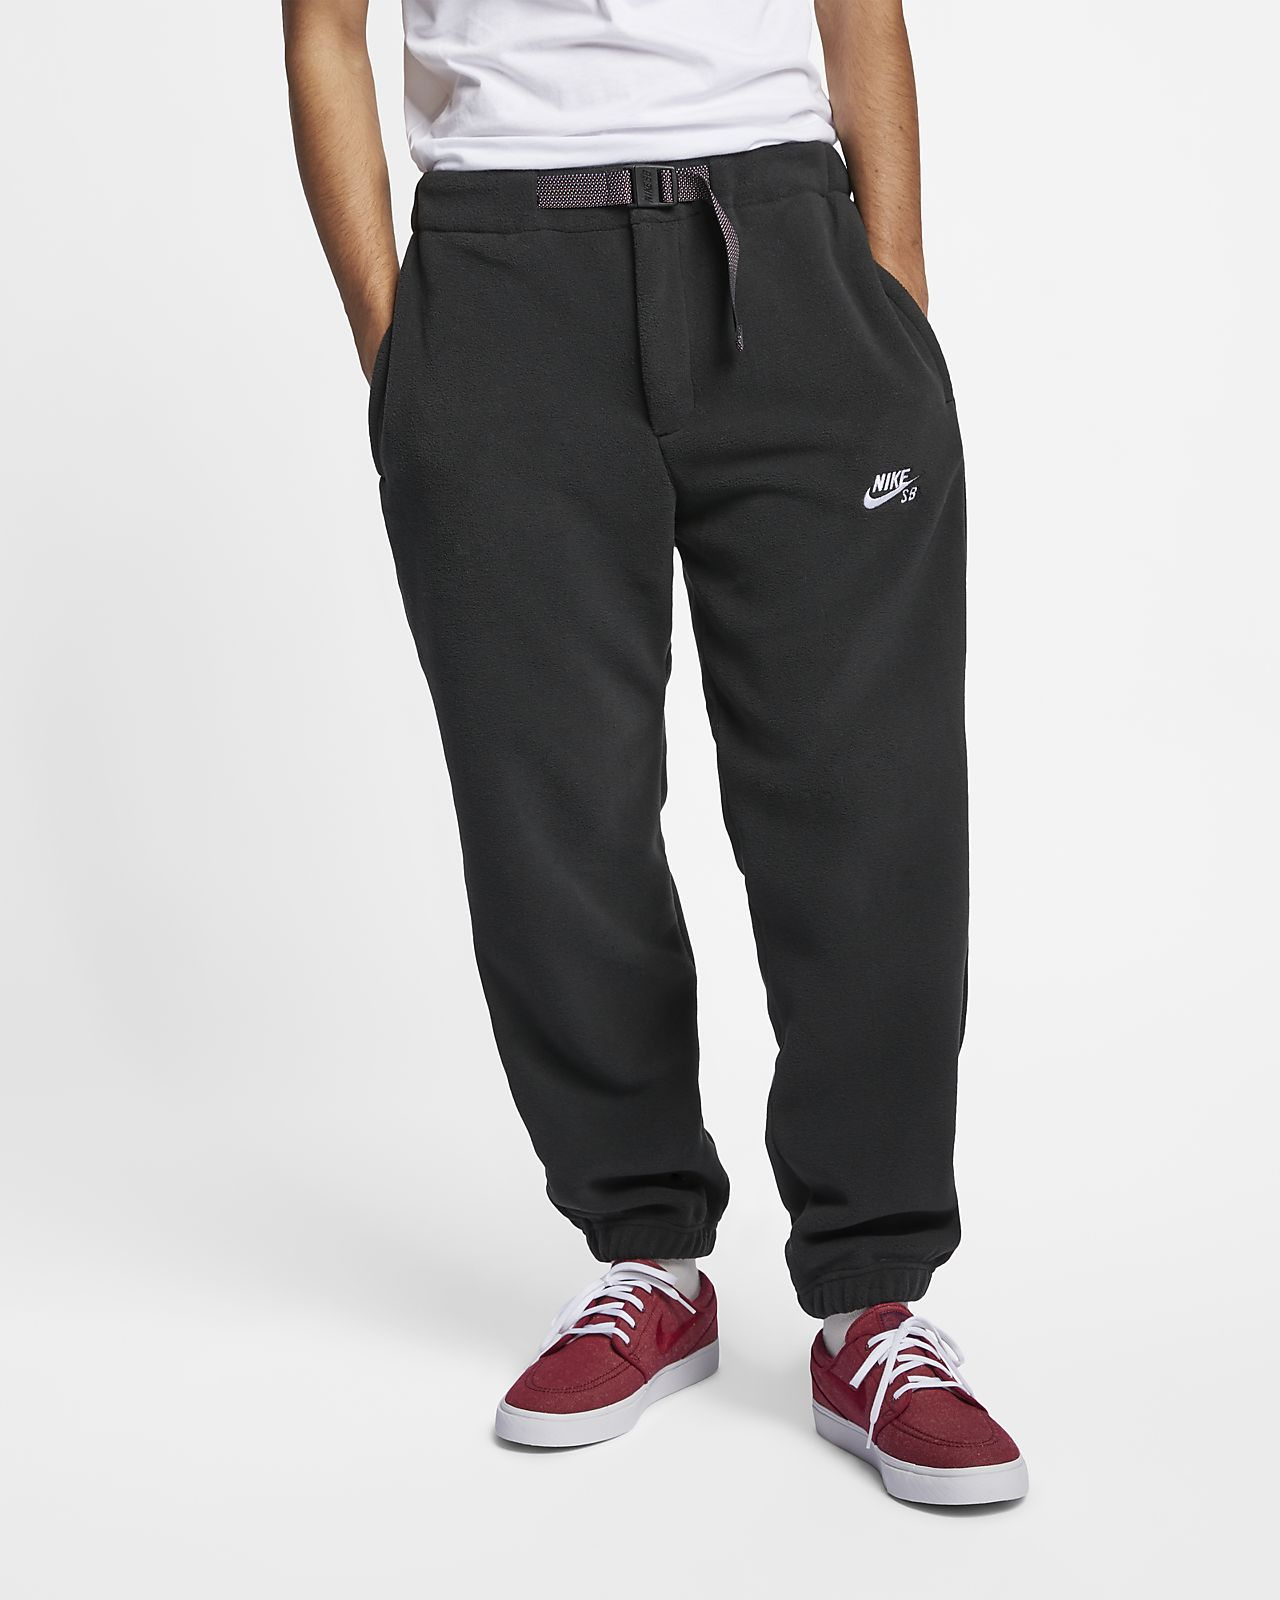 2738a0ecead0 Nike SB Men s Skateboarding Trousers. Nike.com SI